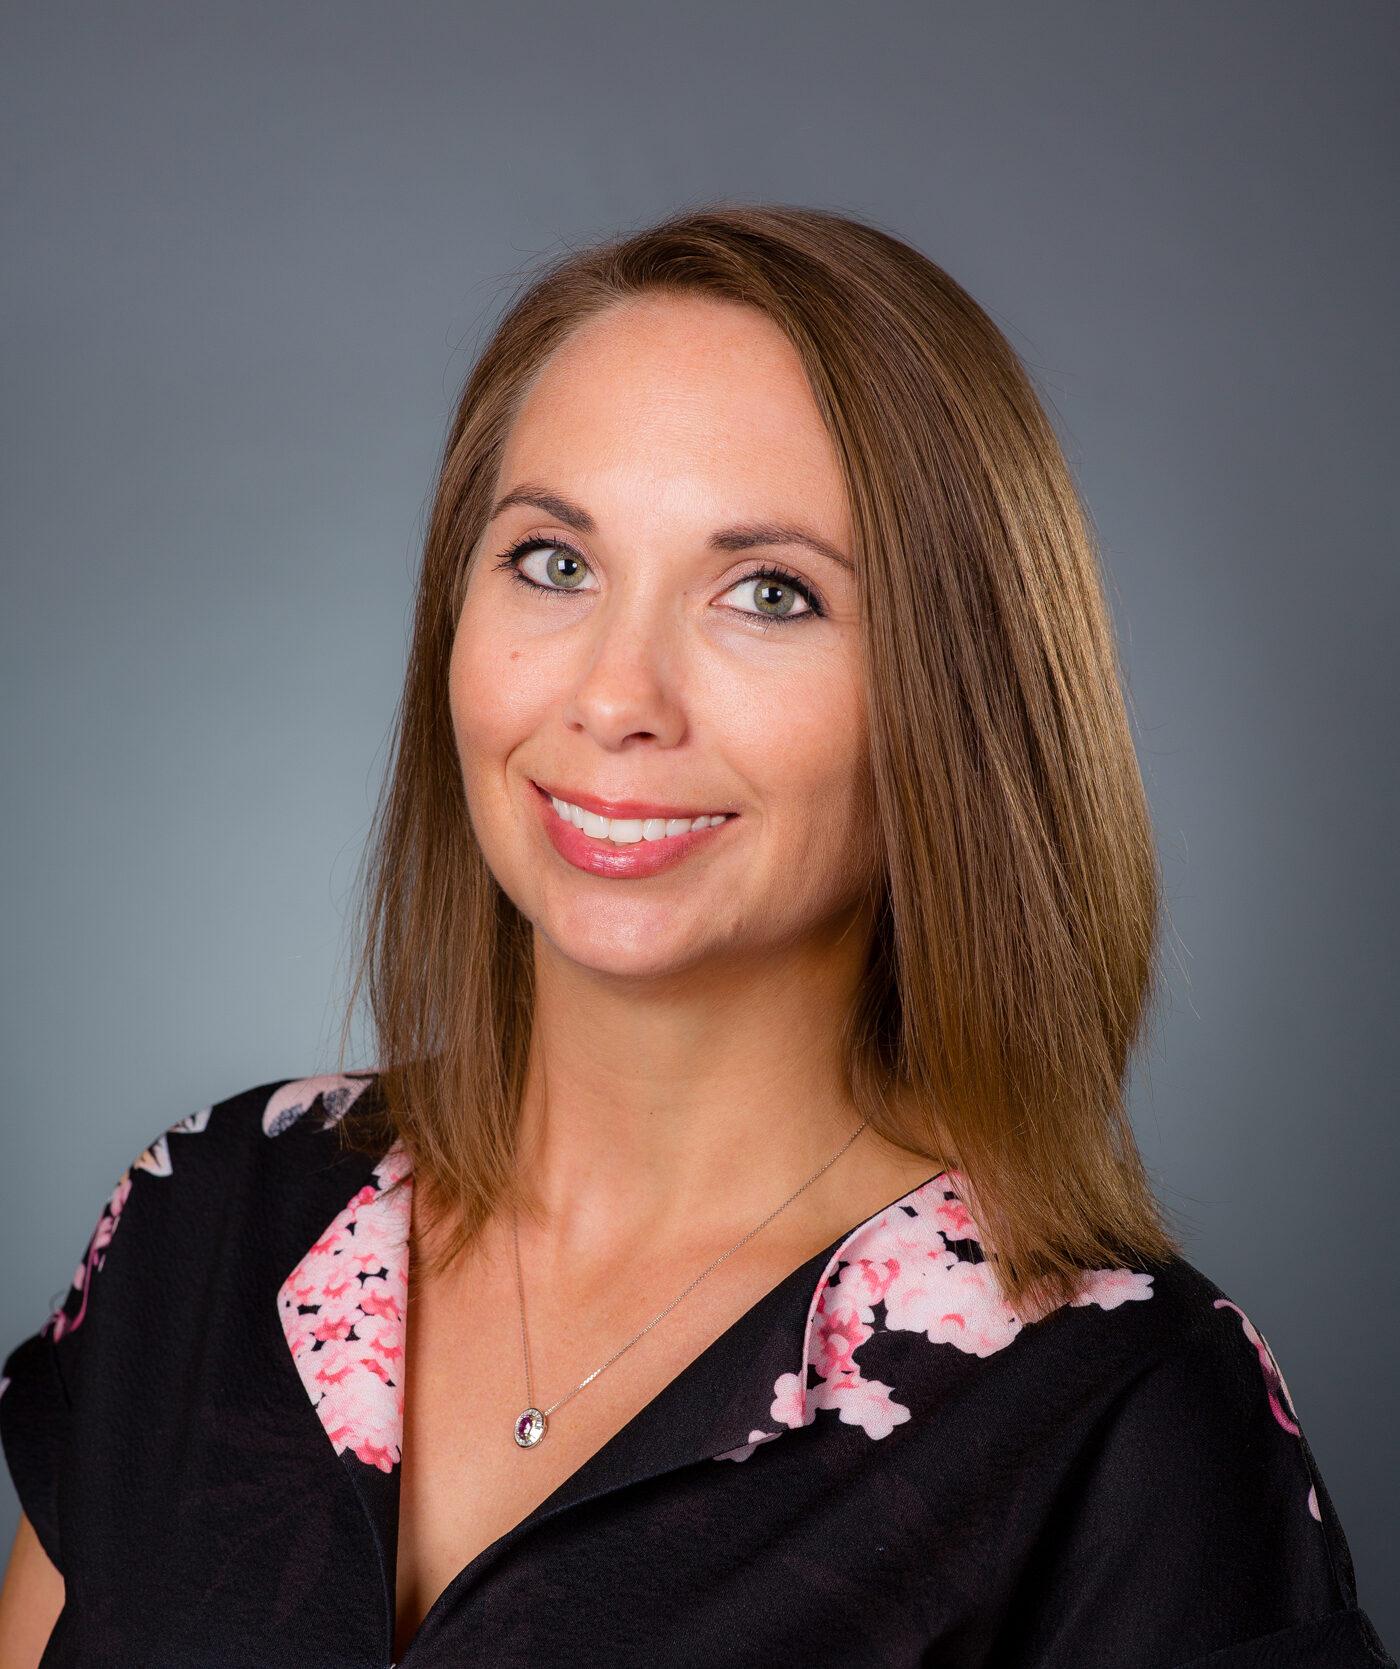 Tara Lukach, Business Advisor